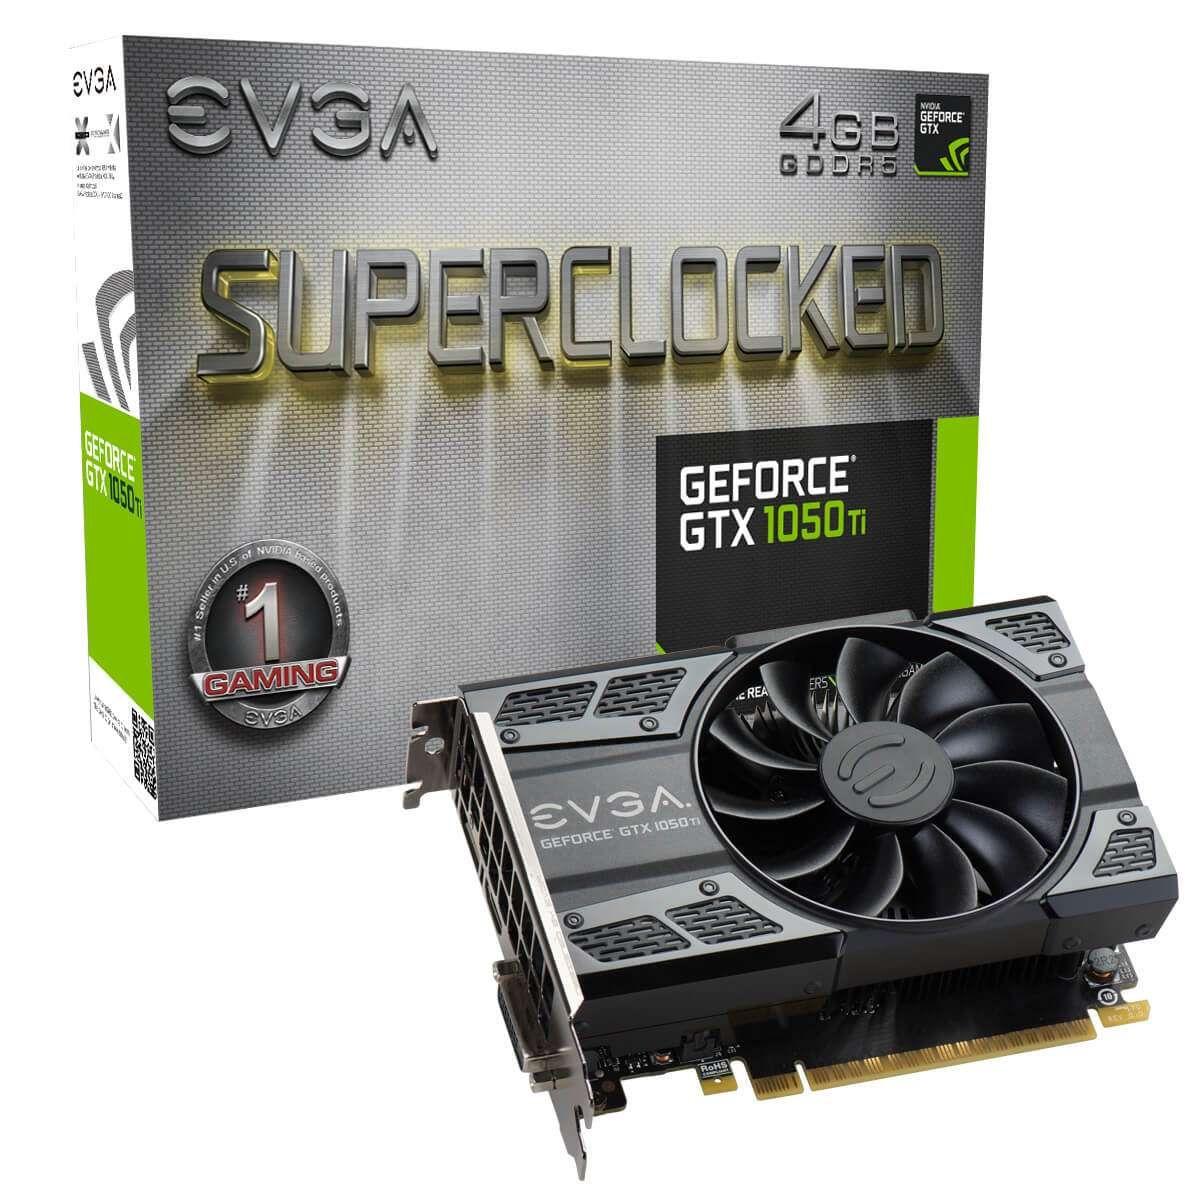 Placa de Vídeo eVGA GeForce GTX 1050TI 4GB SC ACX DDR5 128 Bits - 04G-P4-6253-KR